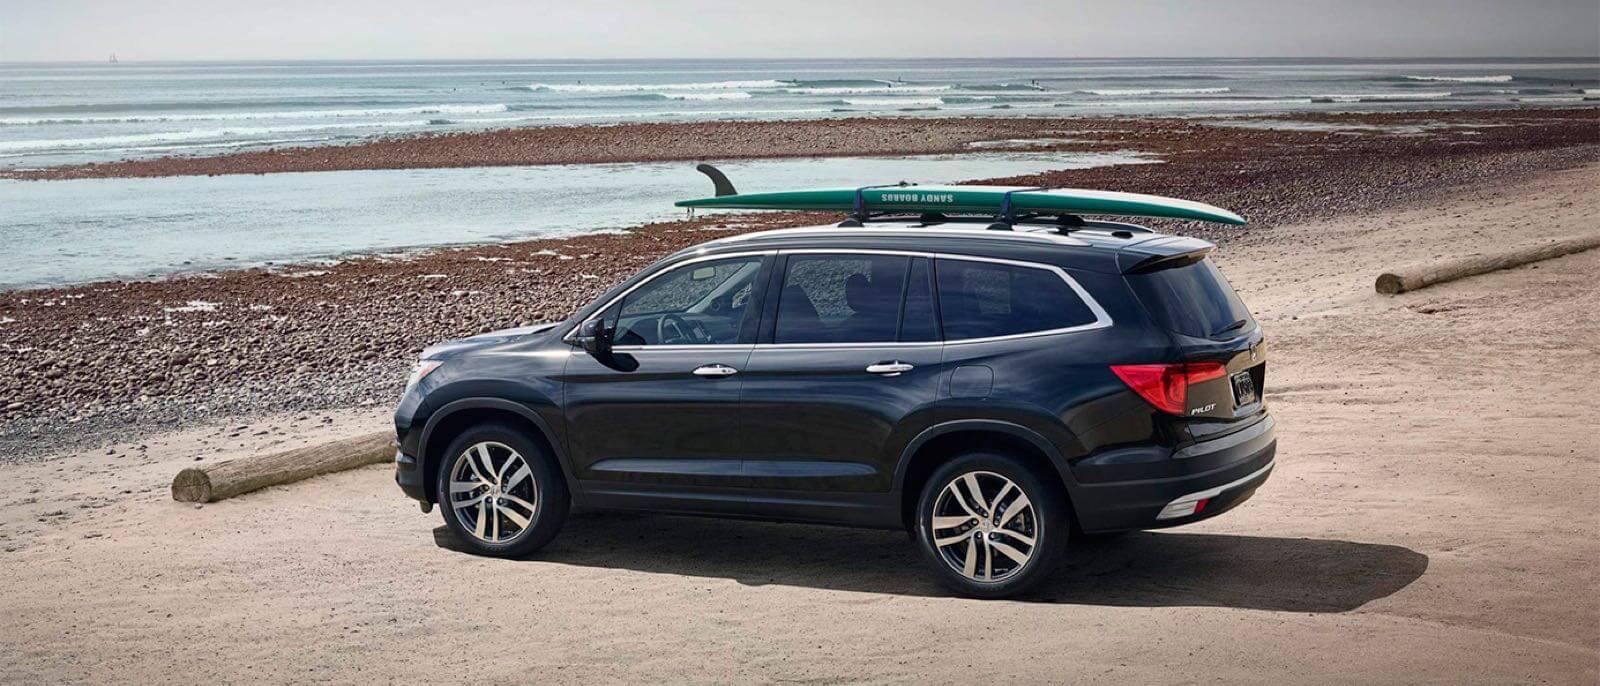 2016 Honda Pilot beach scene